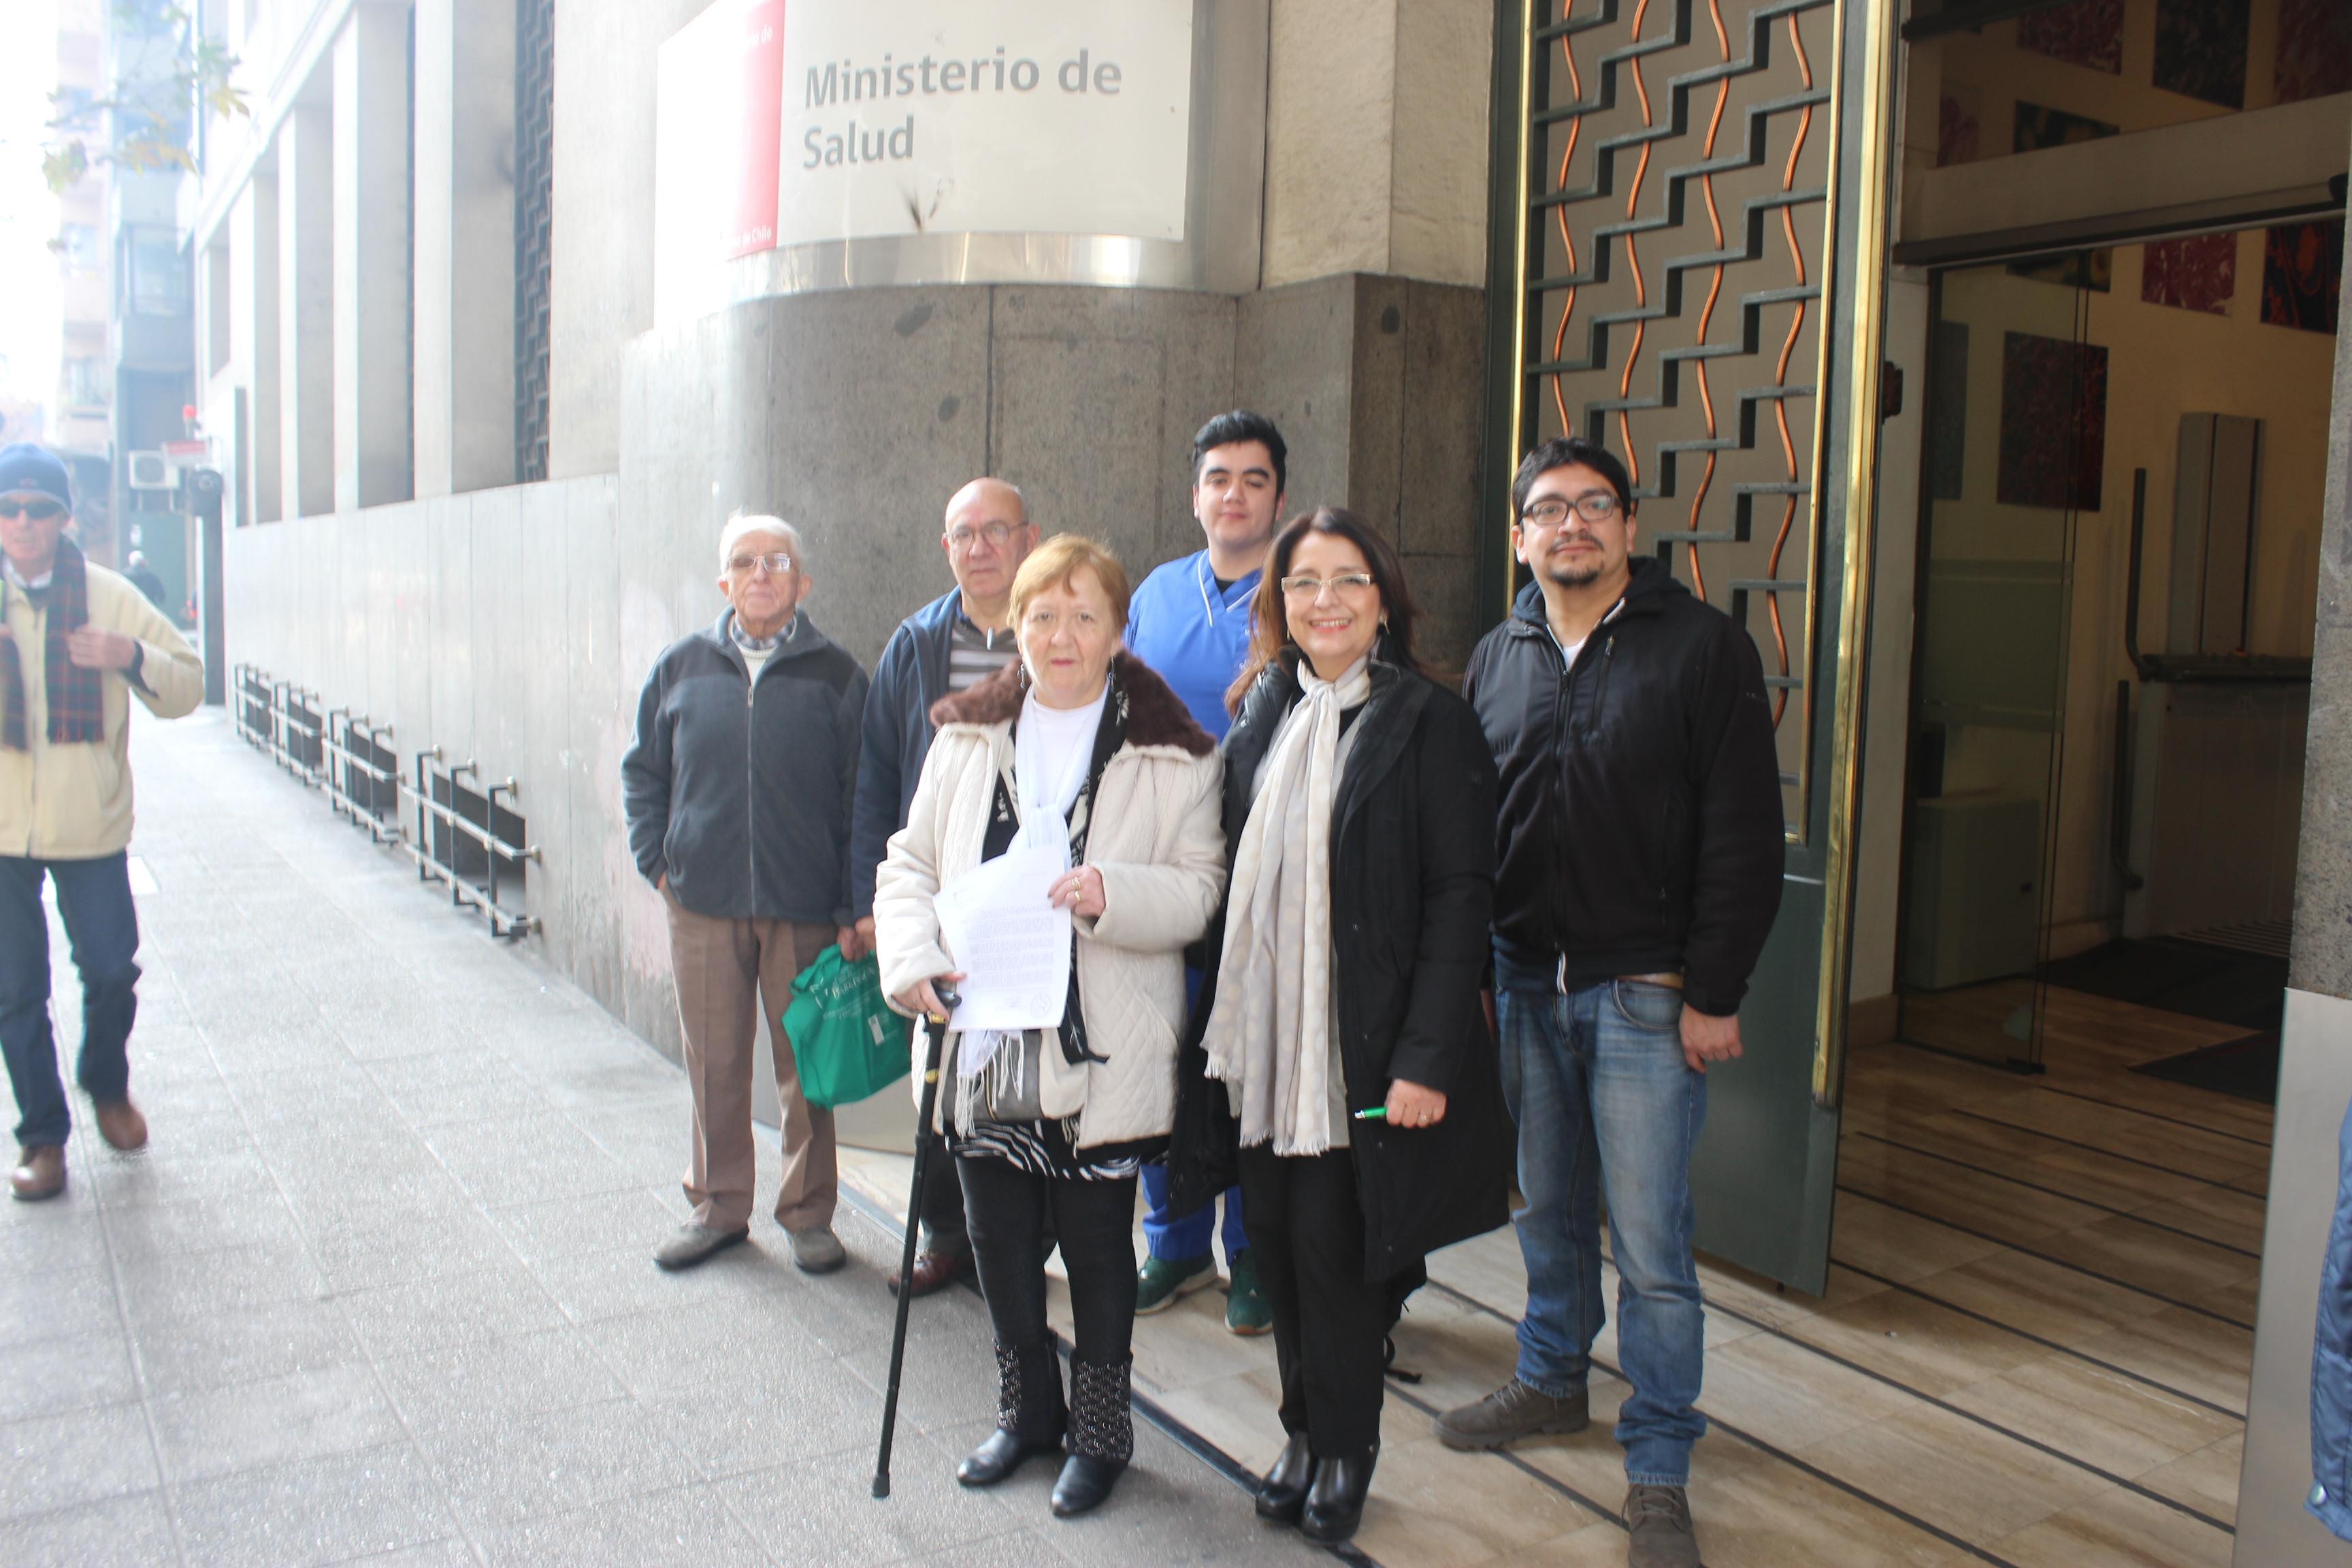 Pacientes con parkinson solicitan financiamiento por Ley Ricarte Soto para costosa terapia | Comunicado de Prensa